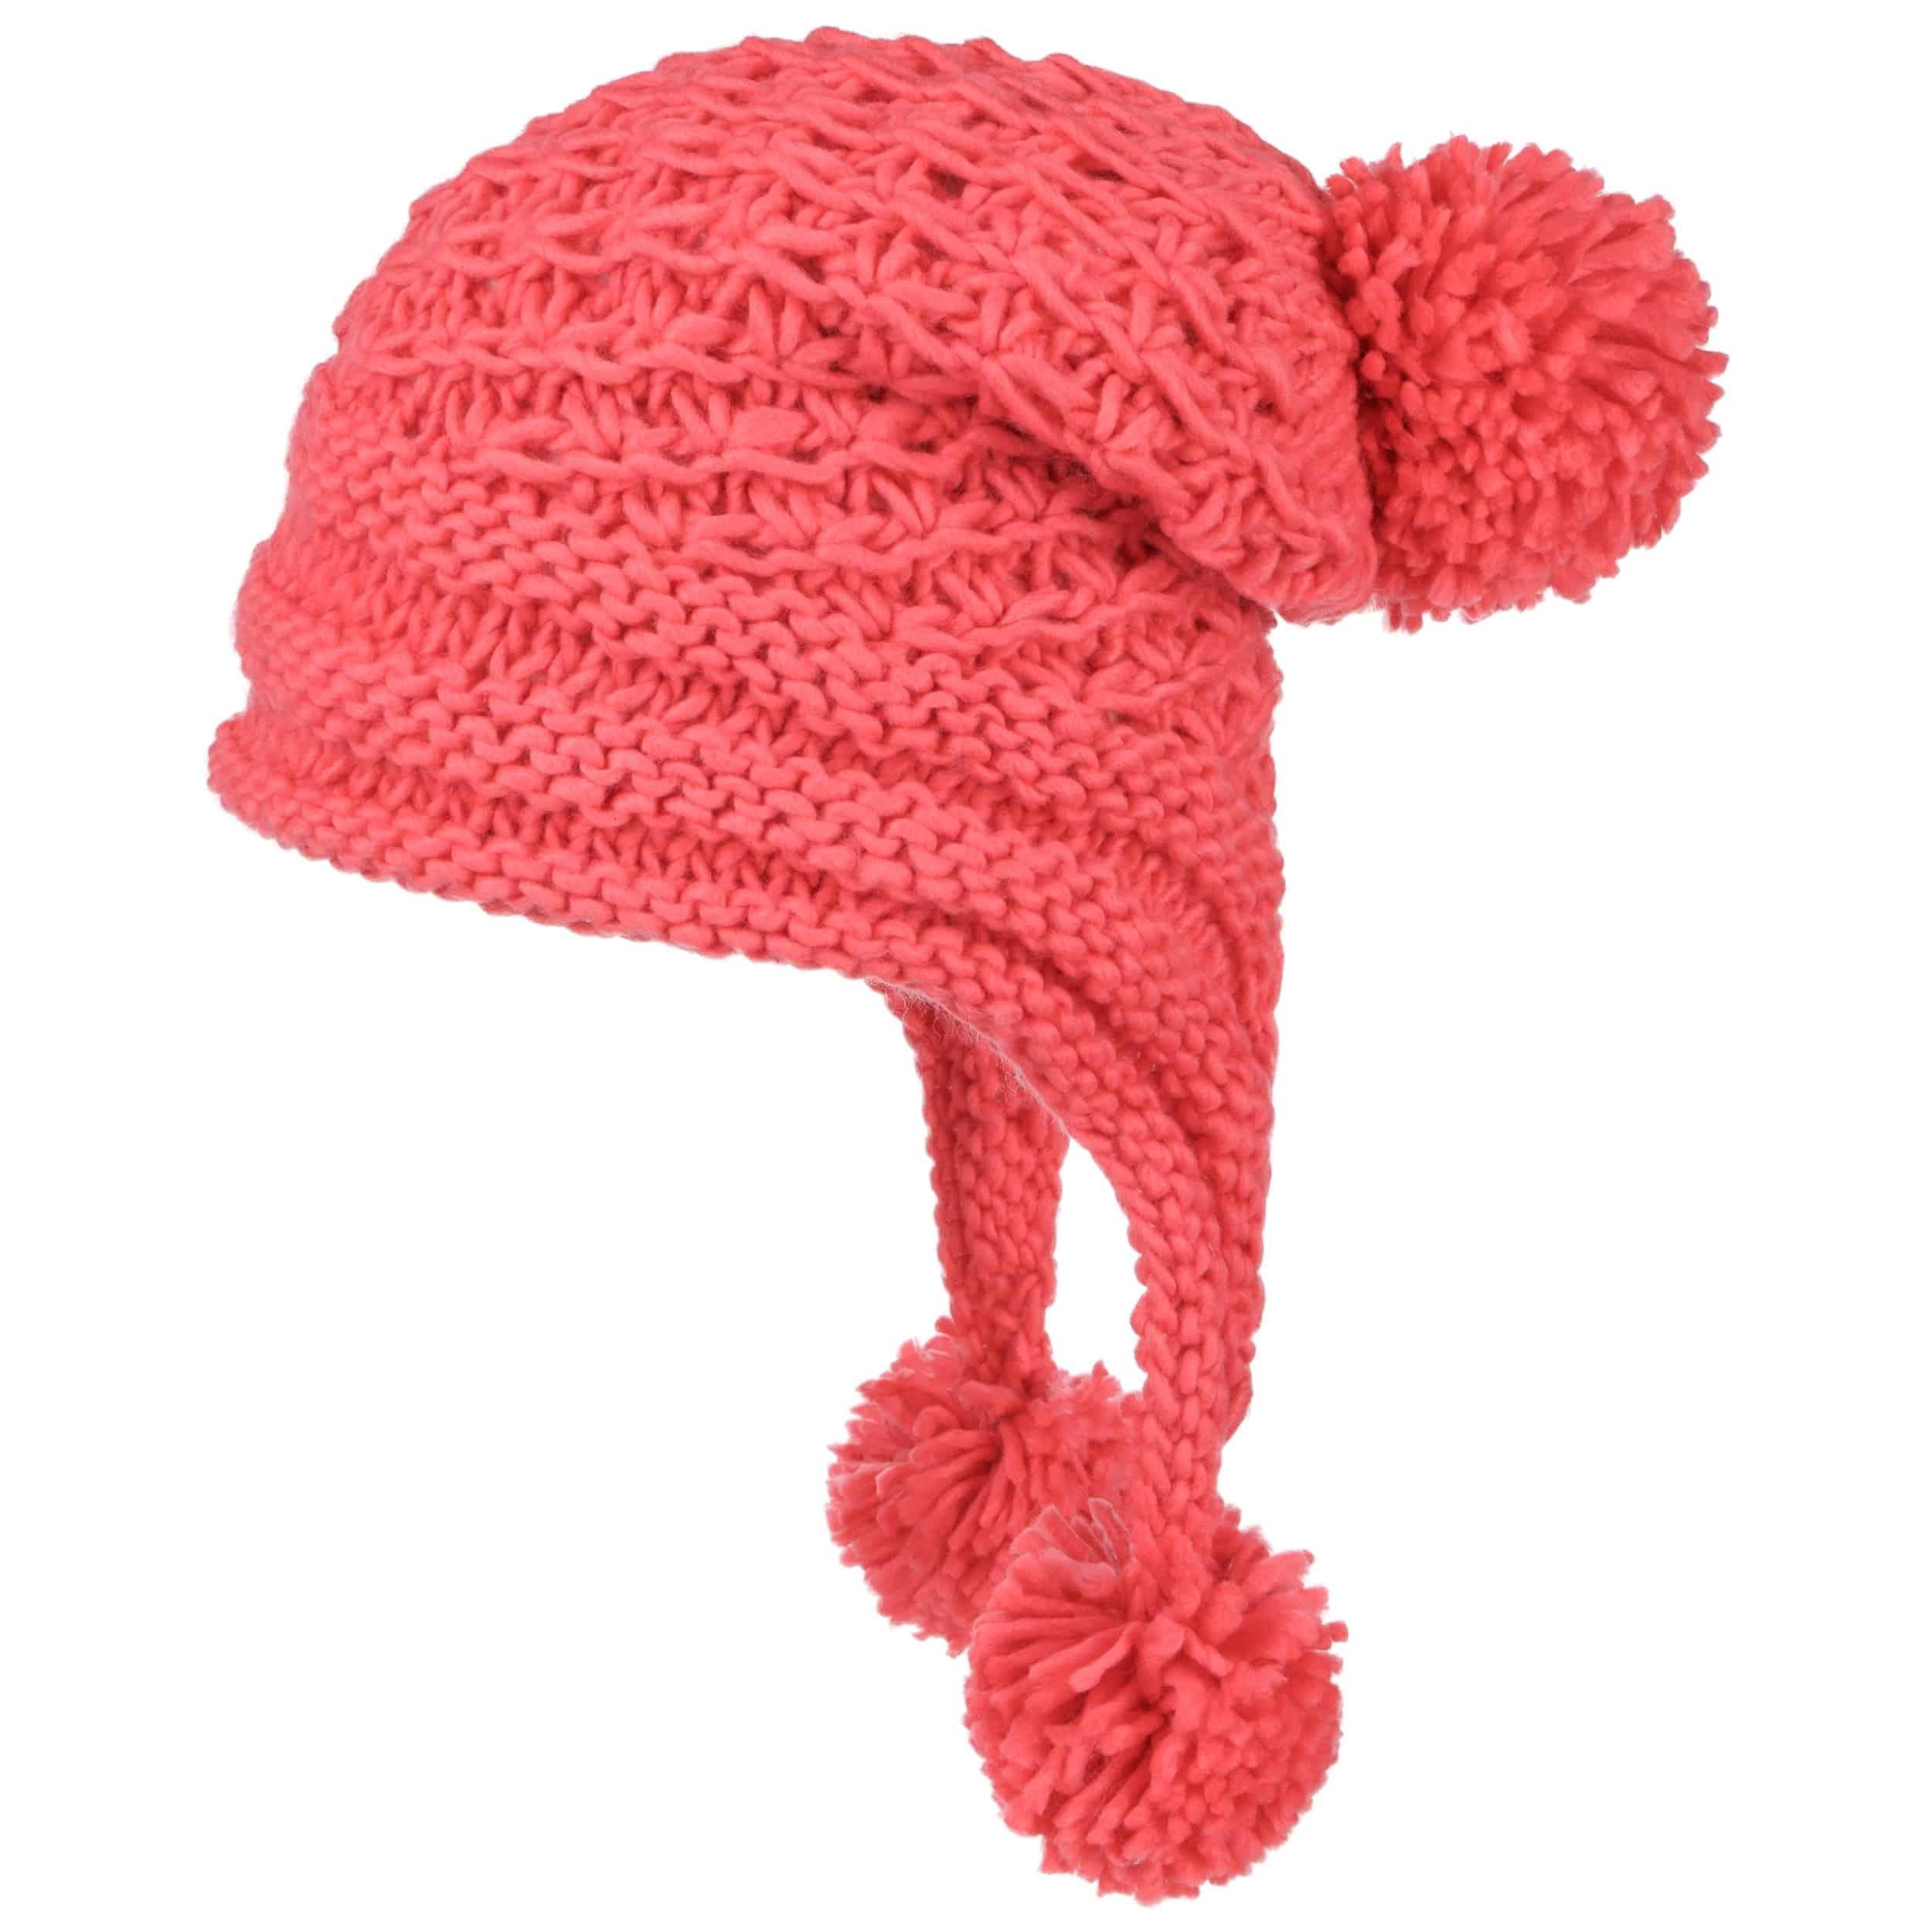 Inca Headband Knitting Pattern : Inca Pompom Hat by Lipodo, GBP 18,95 --> Hats, caps & beanies shop onl...